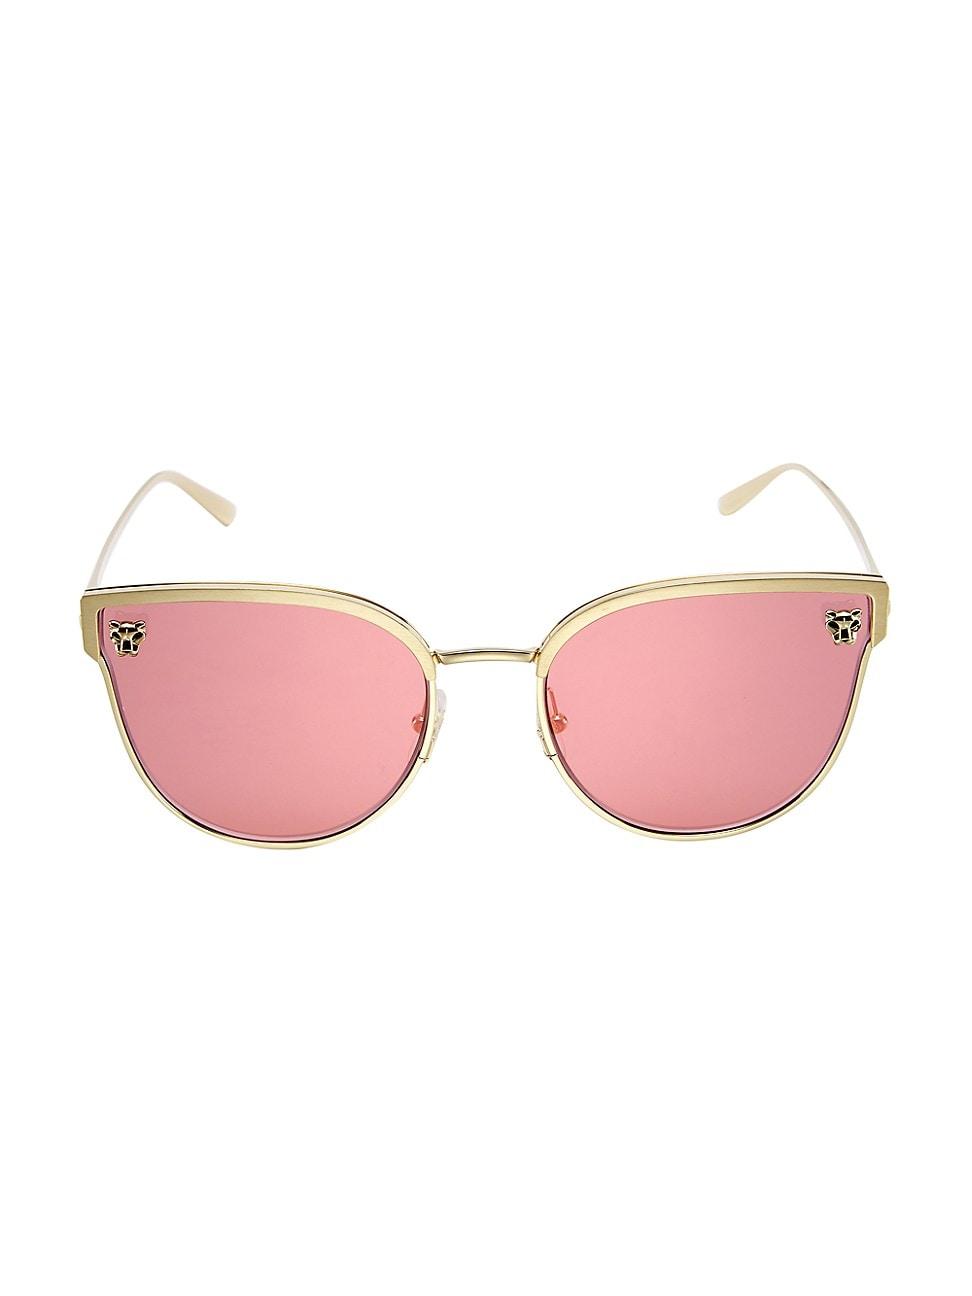 Cartier Women's 59mm Cat Eye Sunglasses In Gold